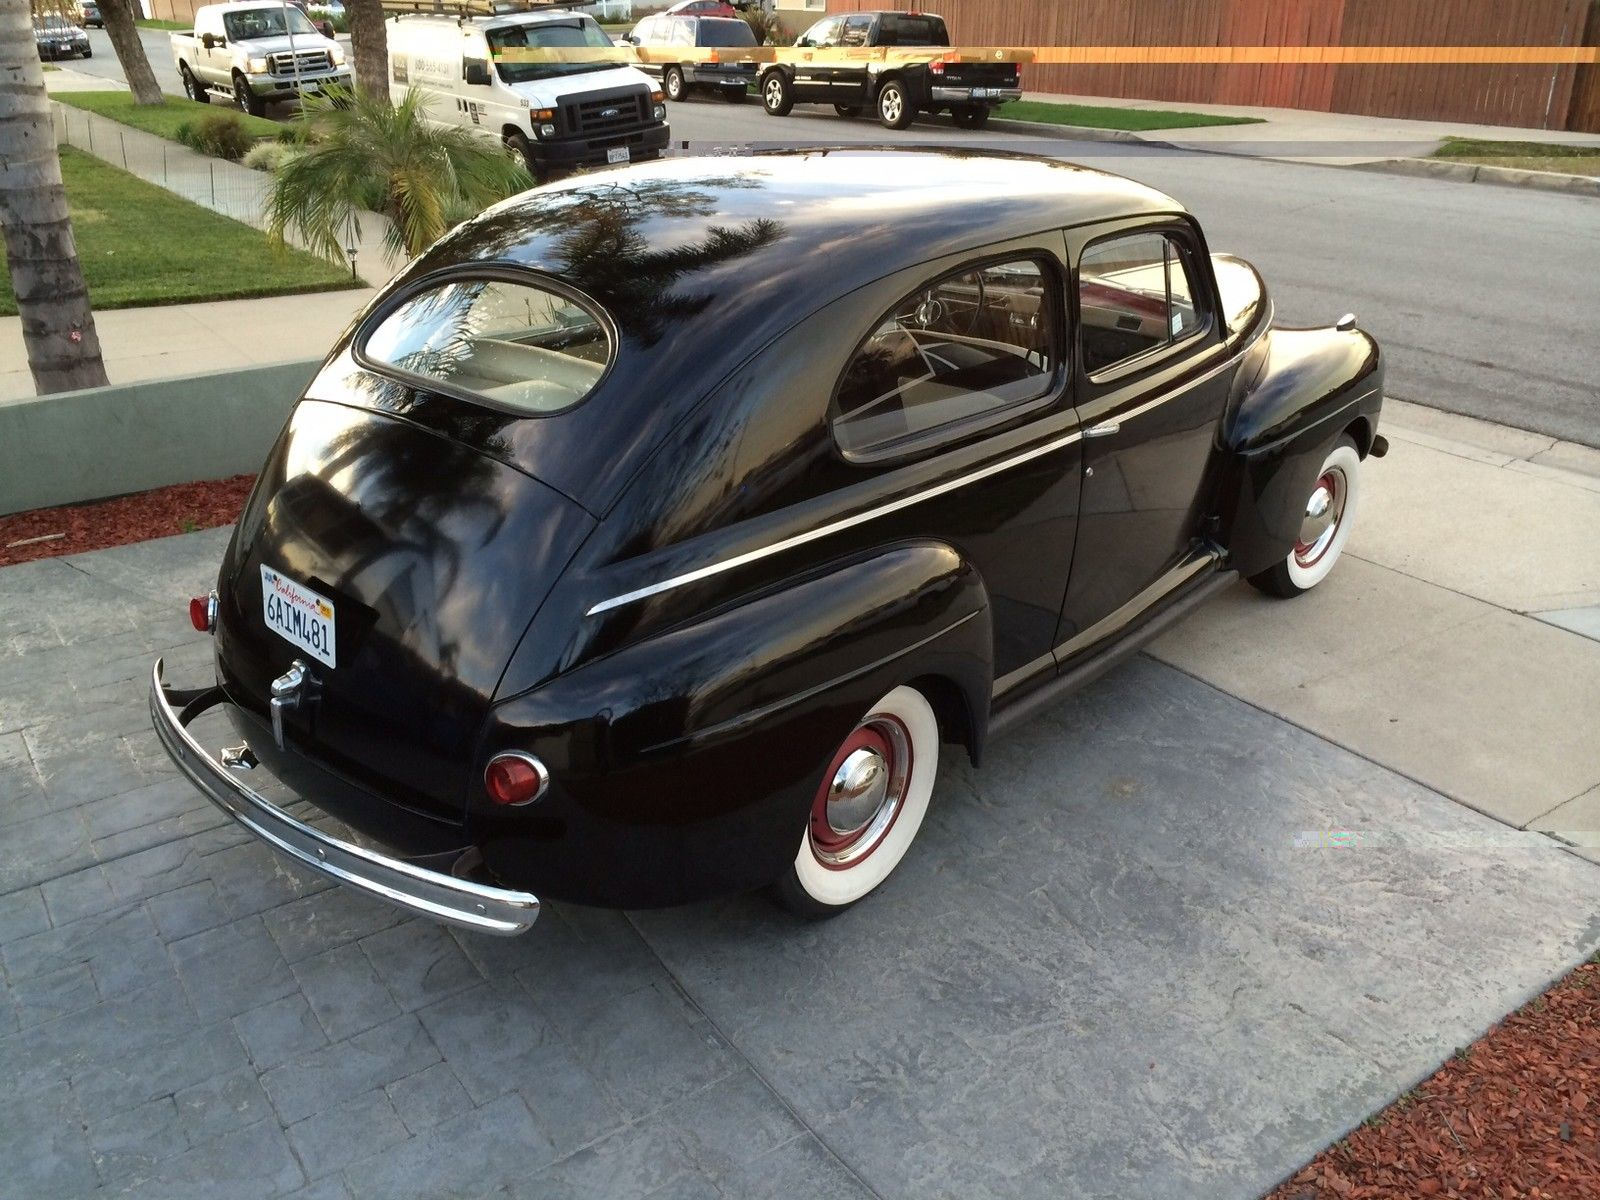 1941 Ford Sedan Survivor Hot Rod Classic 1936 1939 1940 1949 1932 Truck 1934 1929 1950 For Sale In Orange California United States